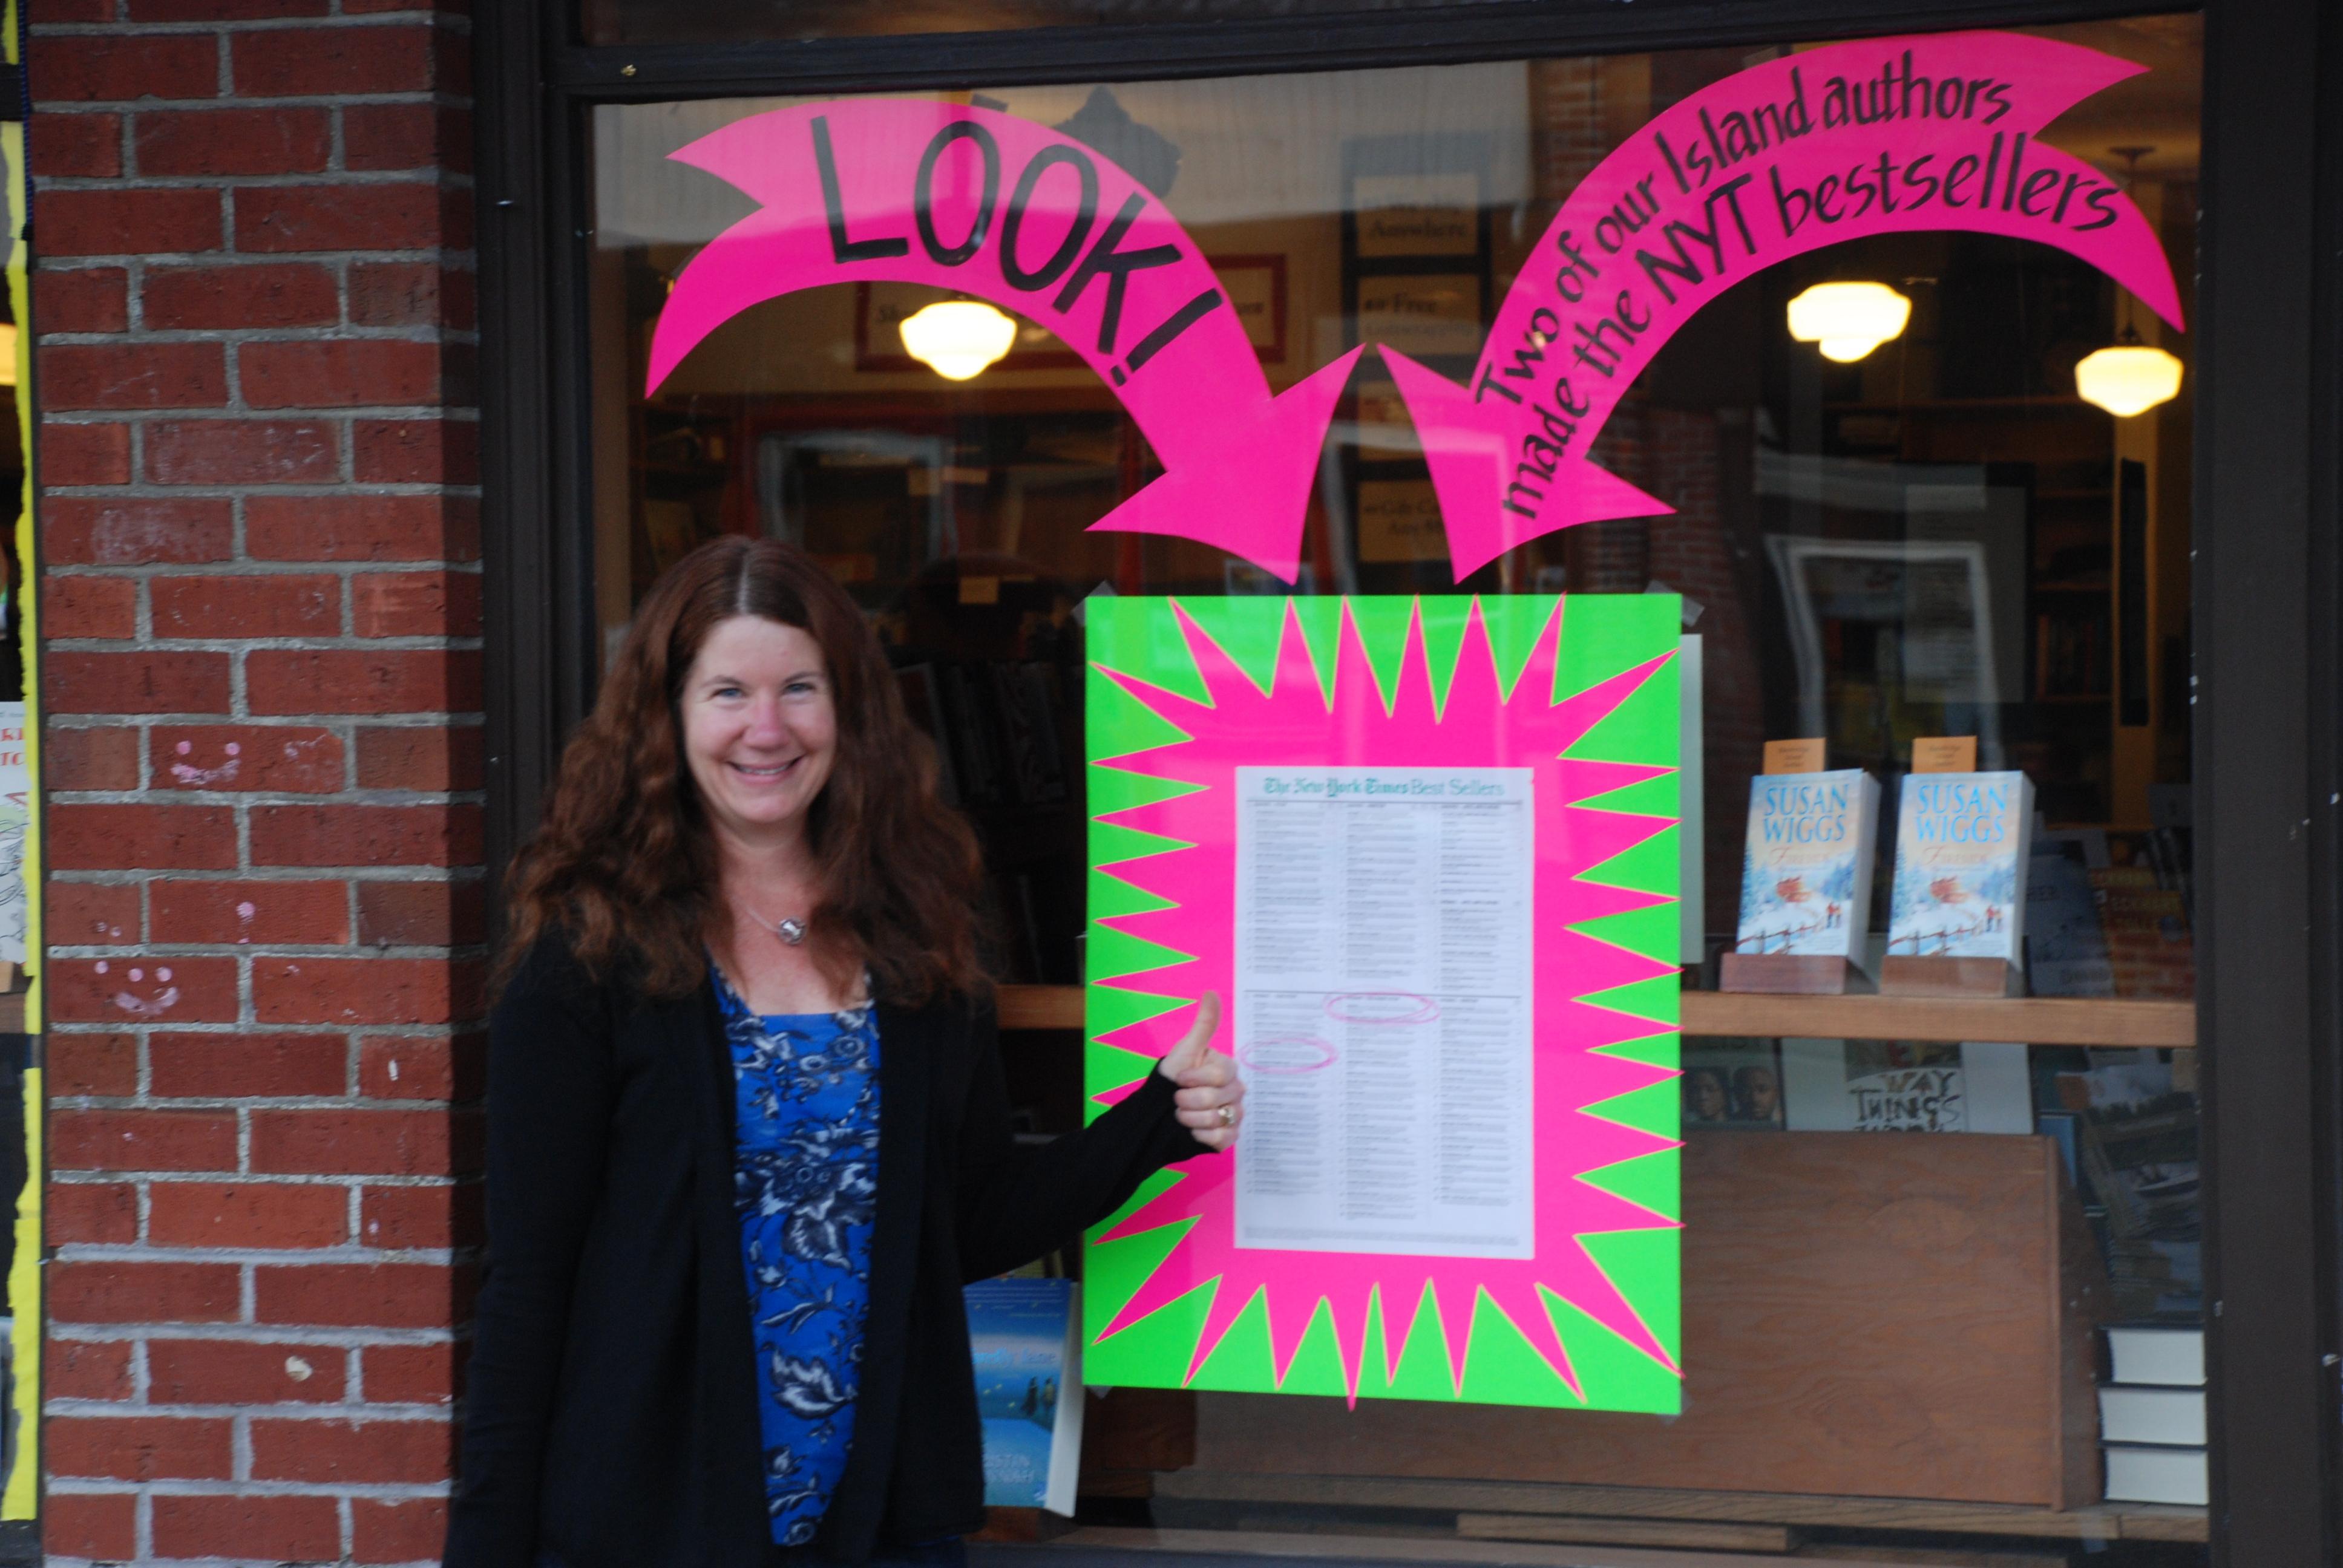 Eagle Harbor celebrates local authors.